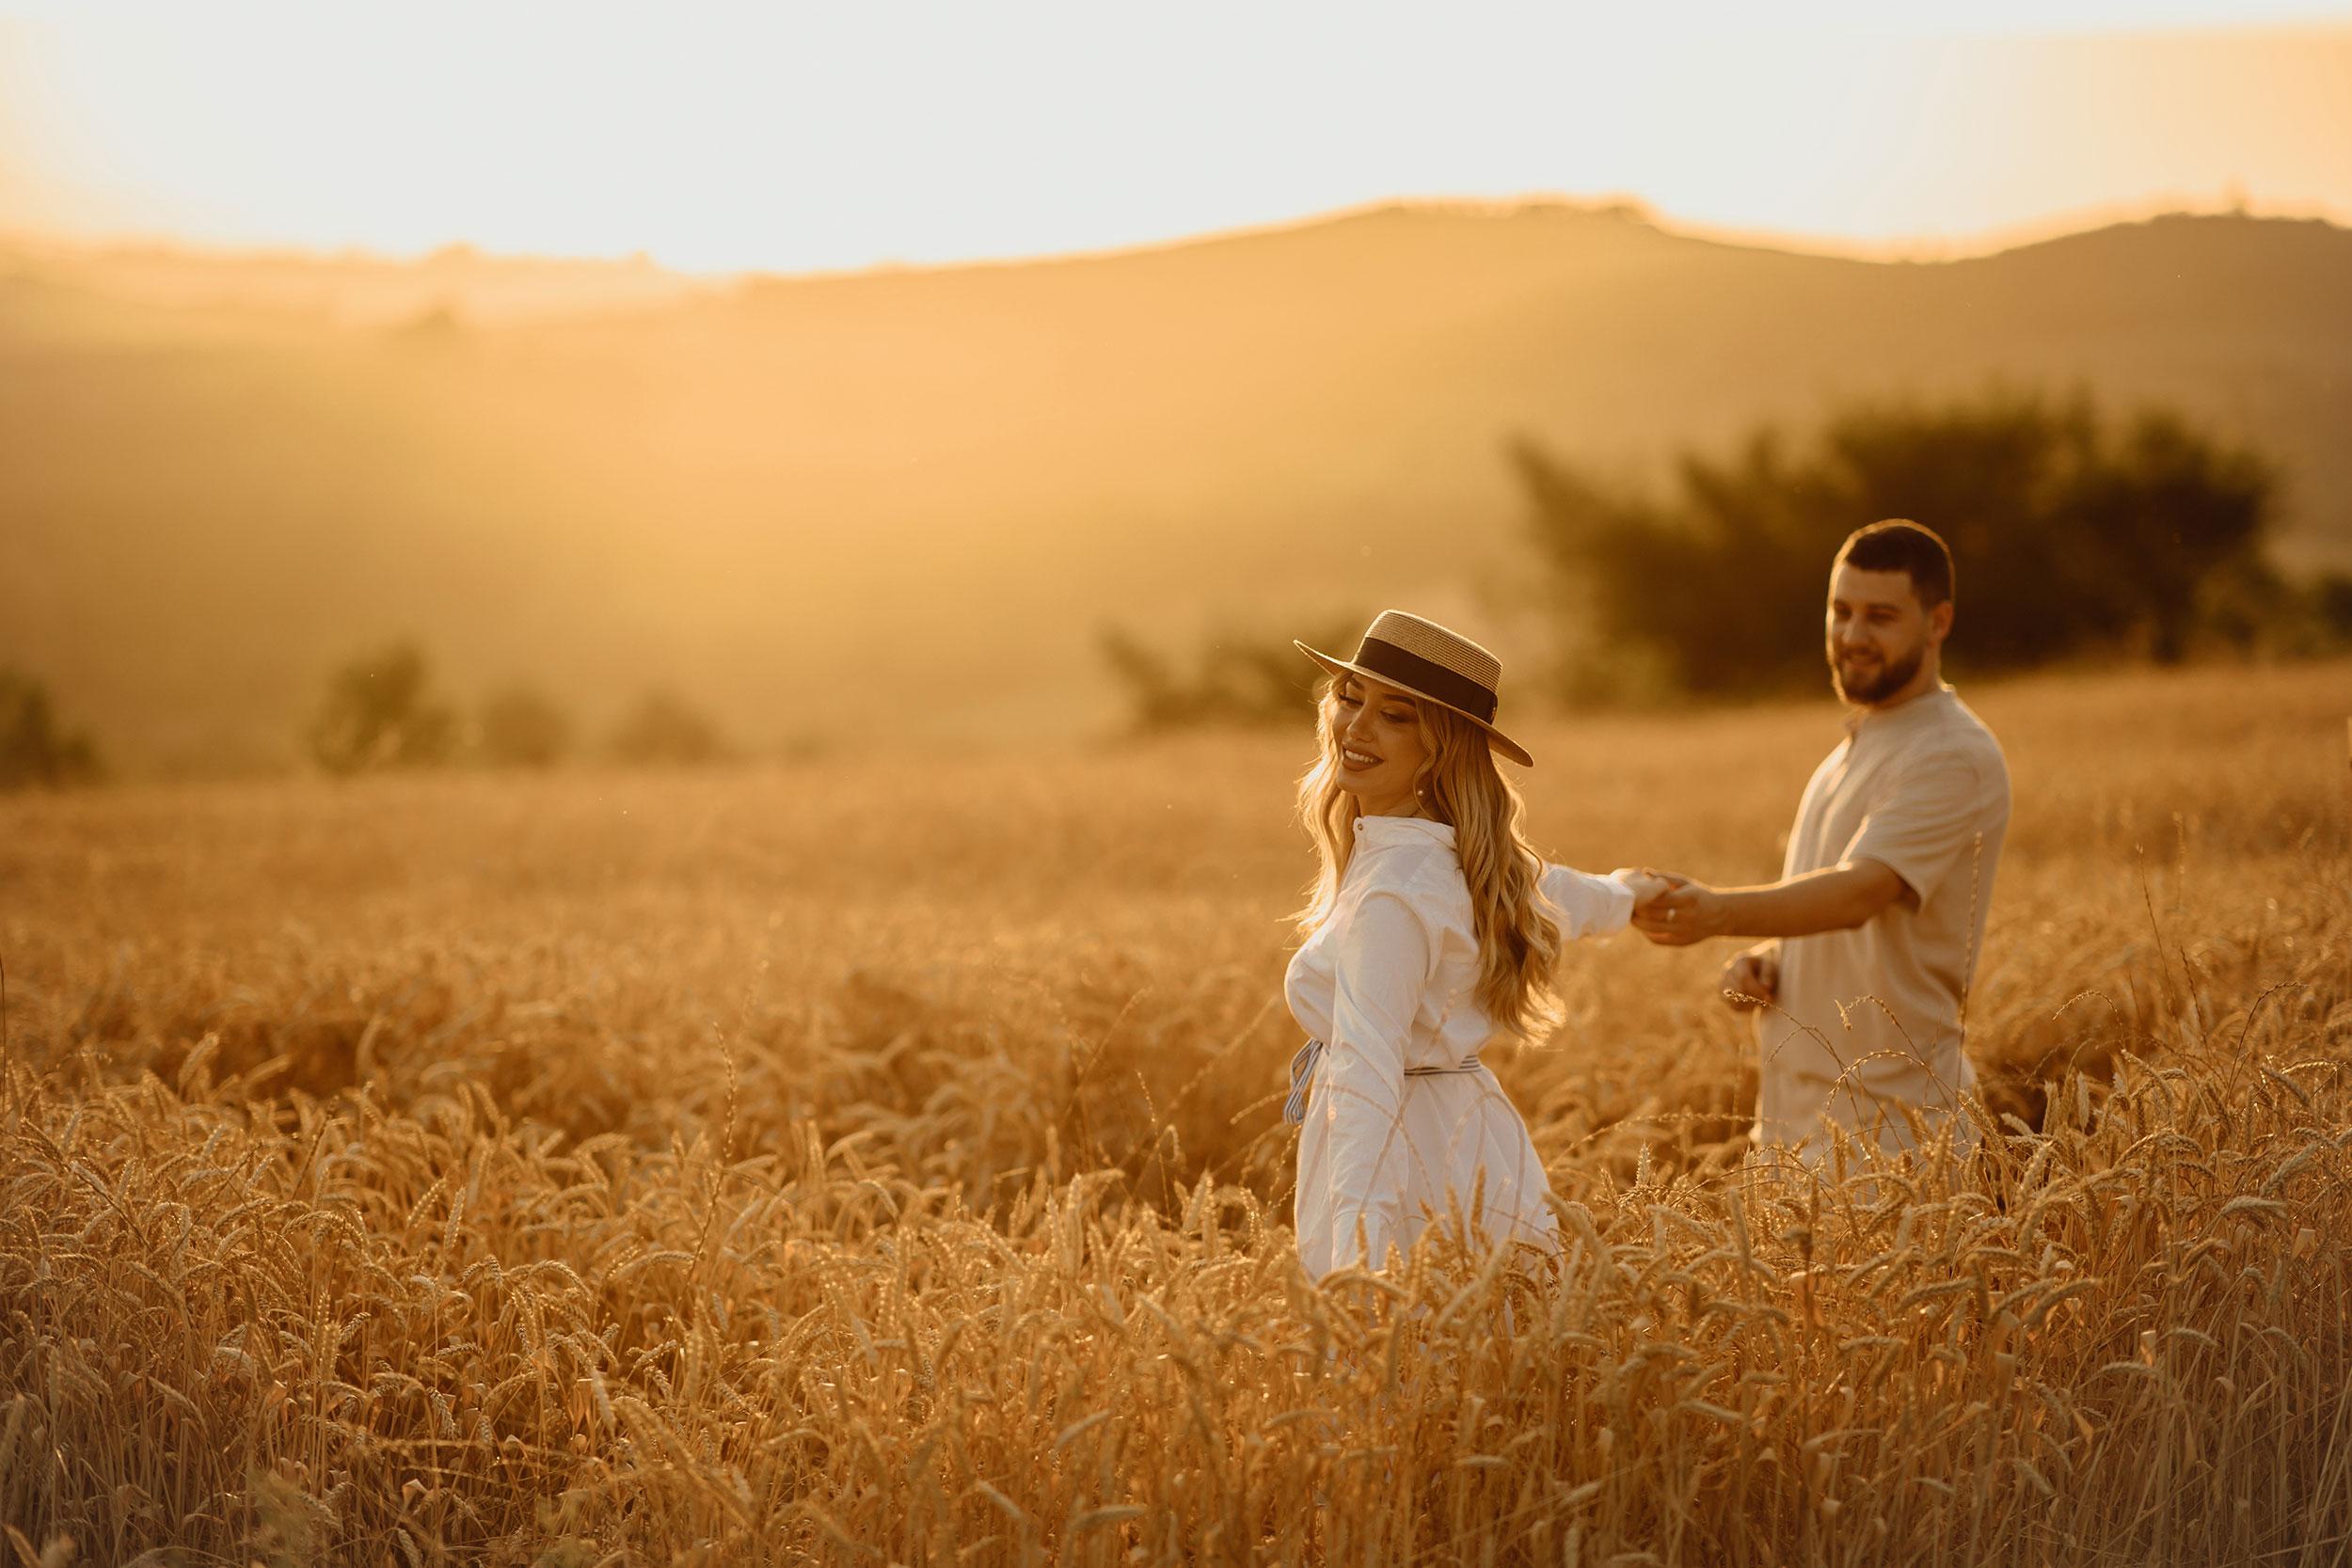 Boyfriend holding his girlfriend's hand in a golden field